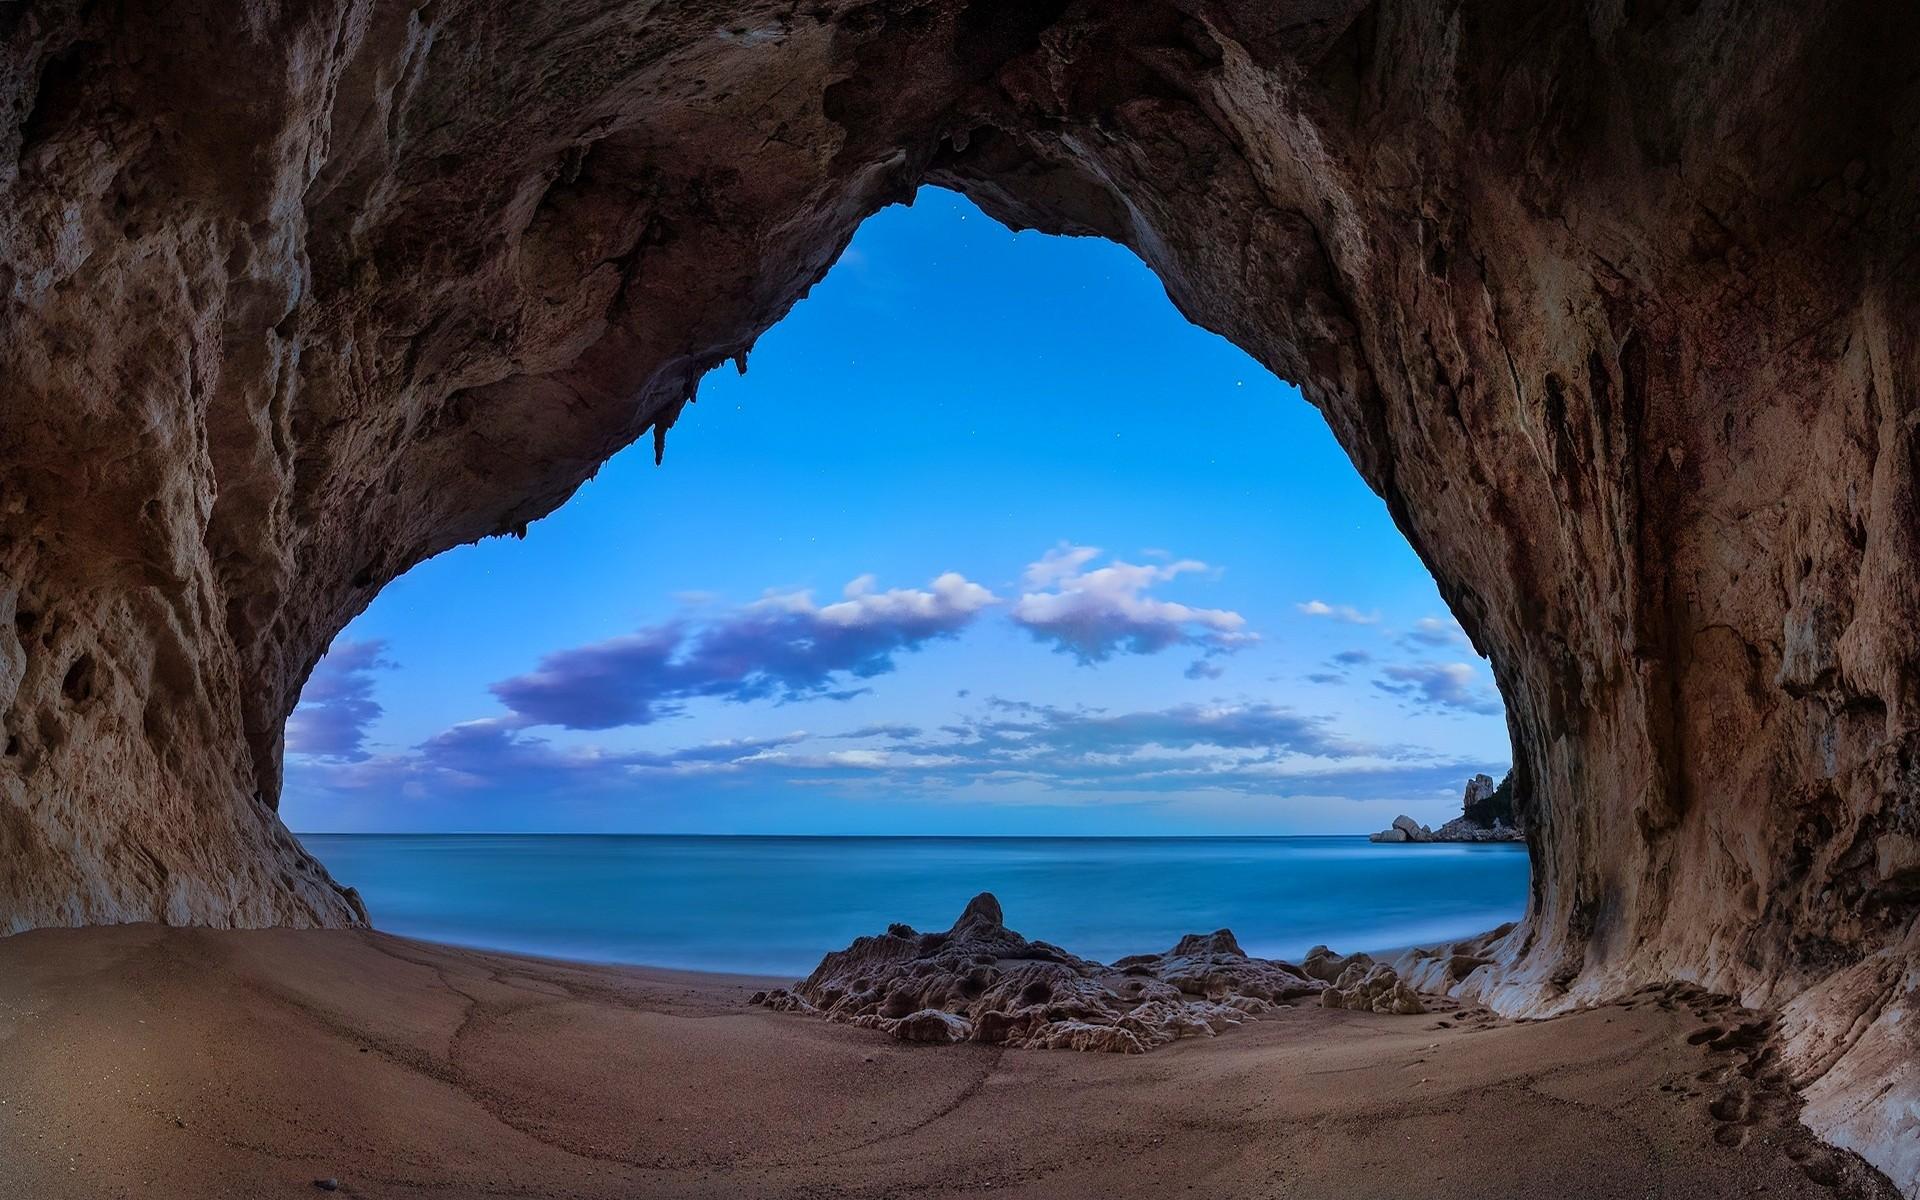 Cute Palm Tree Wallpaper Landscape Nature Beach Cave Rock Sea Clouds Morning